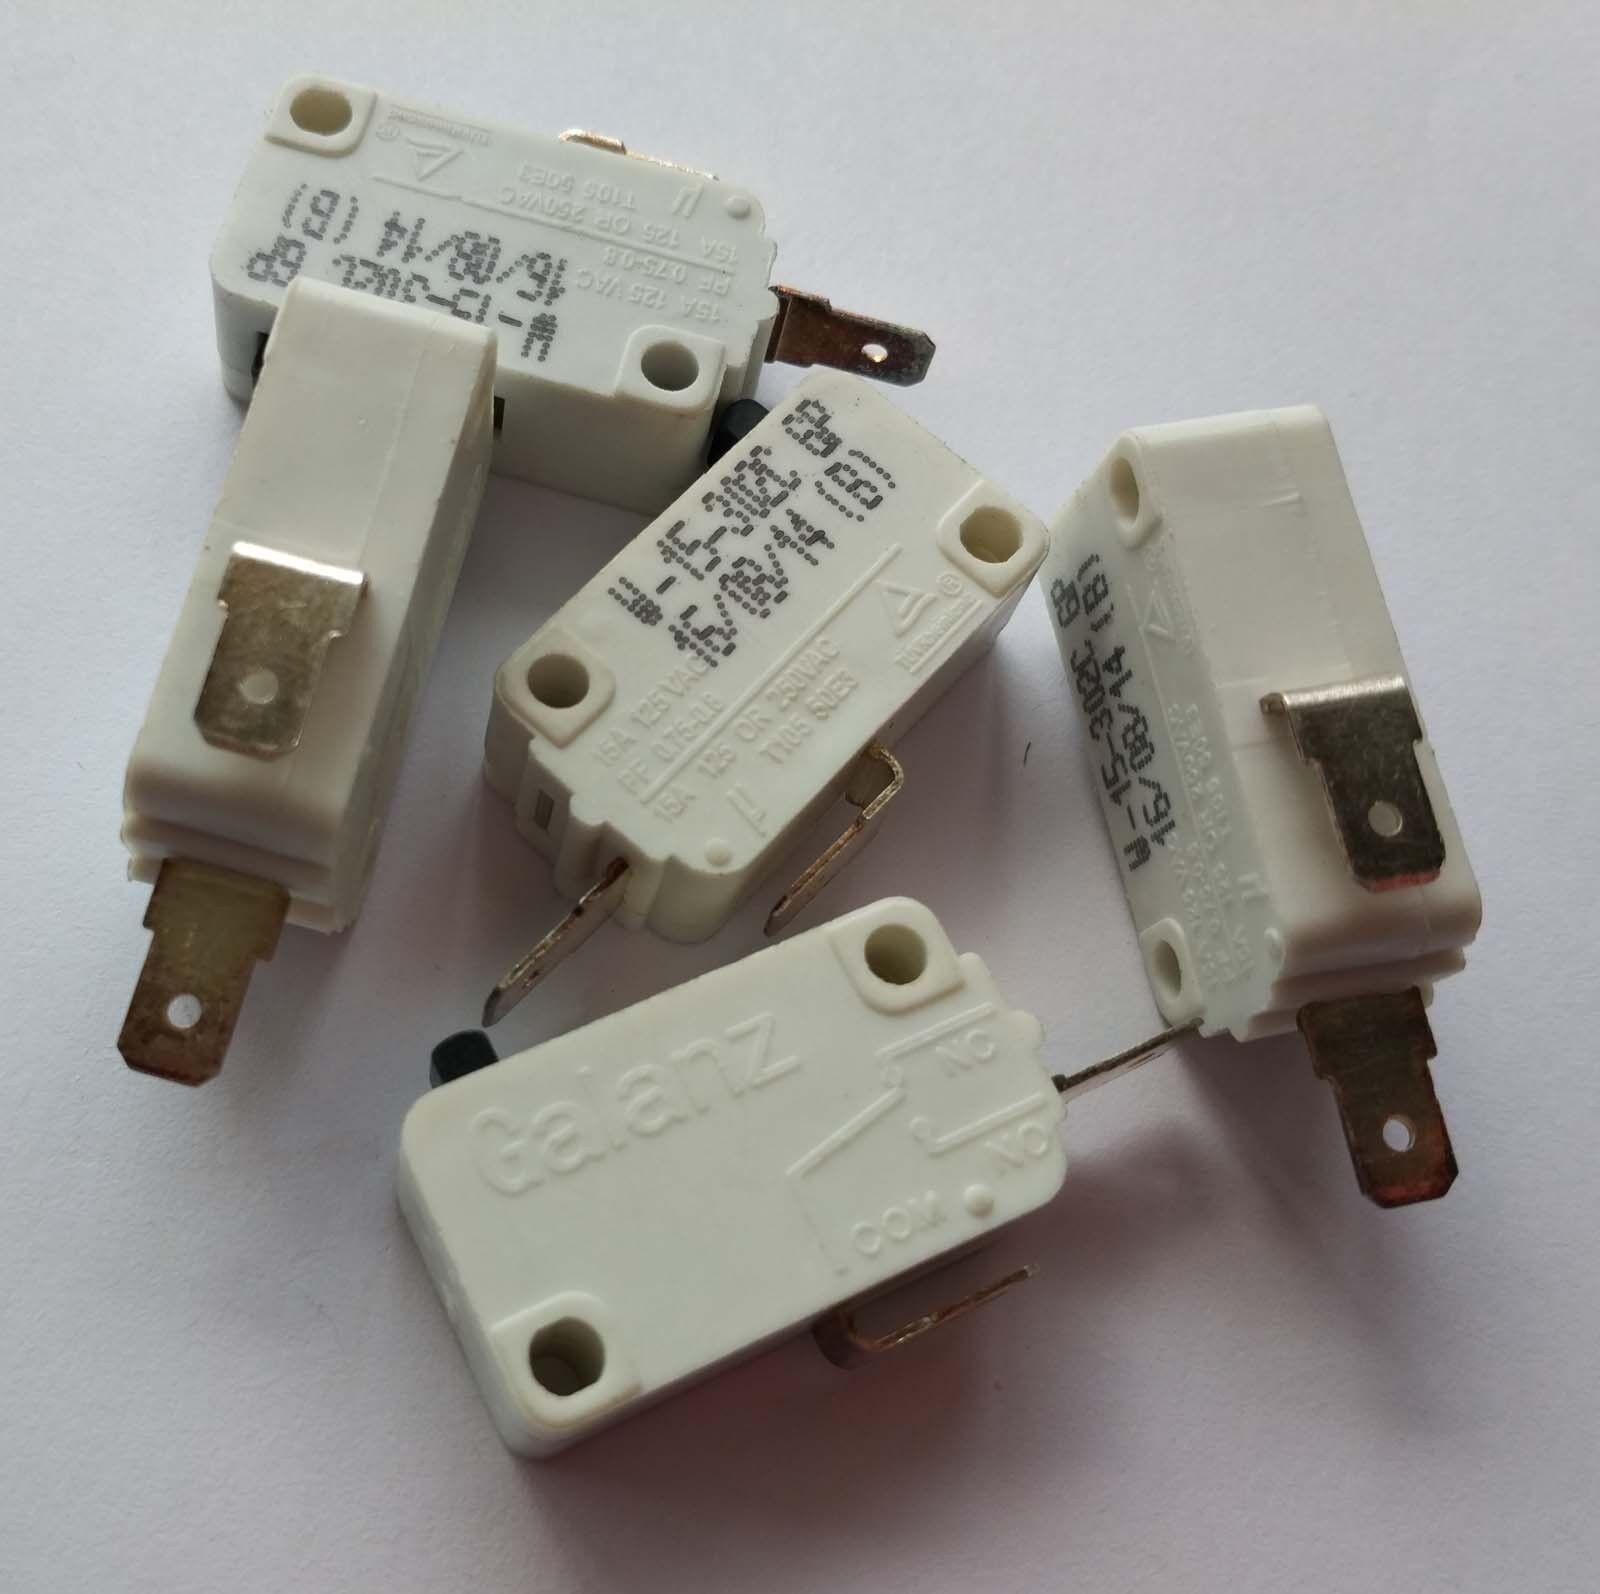 5pcs W-15-302C Microwave Universal Interlock Switch